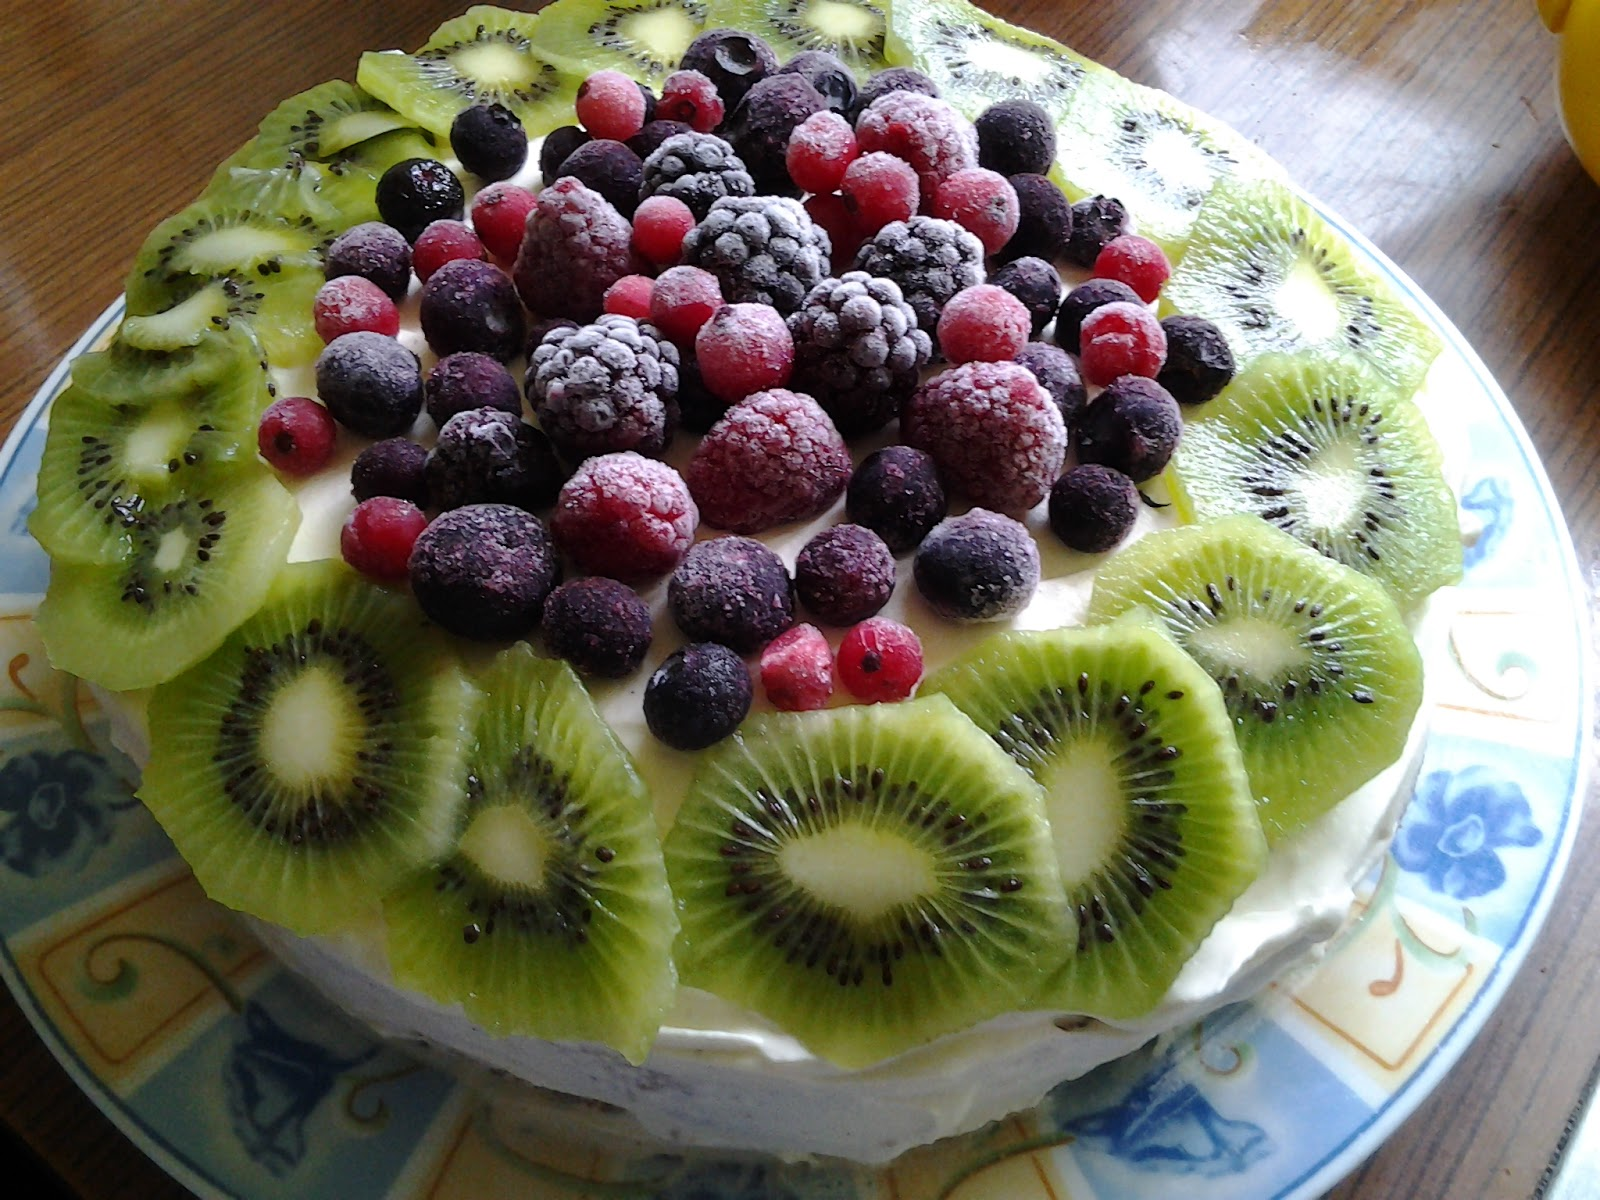 In Cake Tin Basic Sponge What Temp